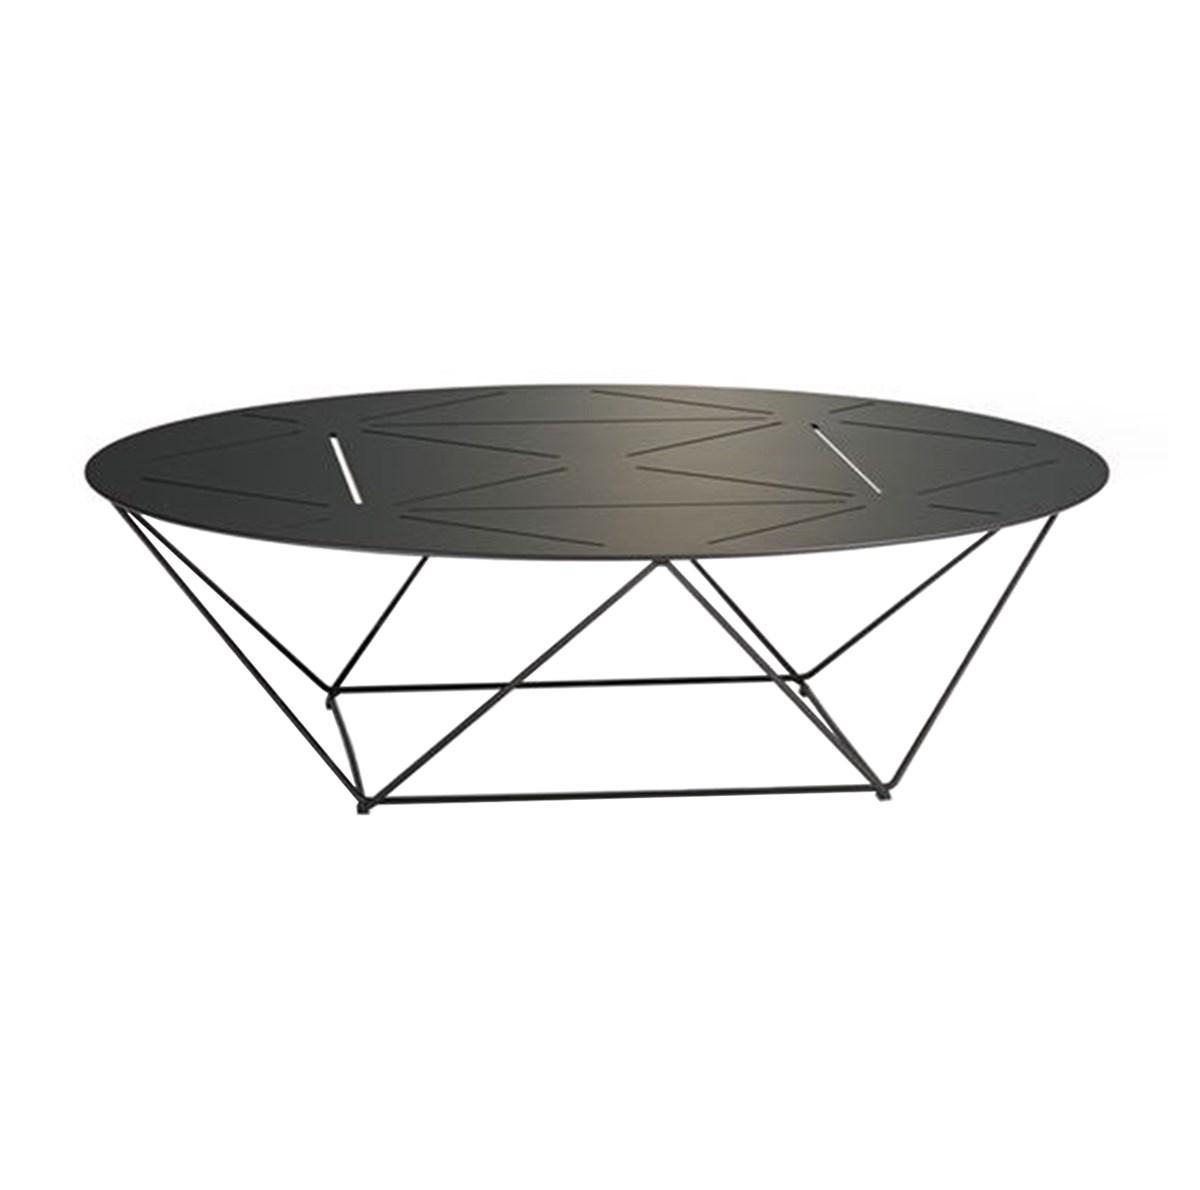 Walter-Knoll-EOOS-Joco-Table-Matisse-1